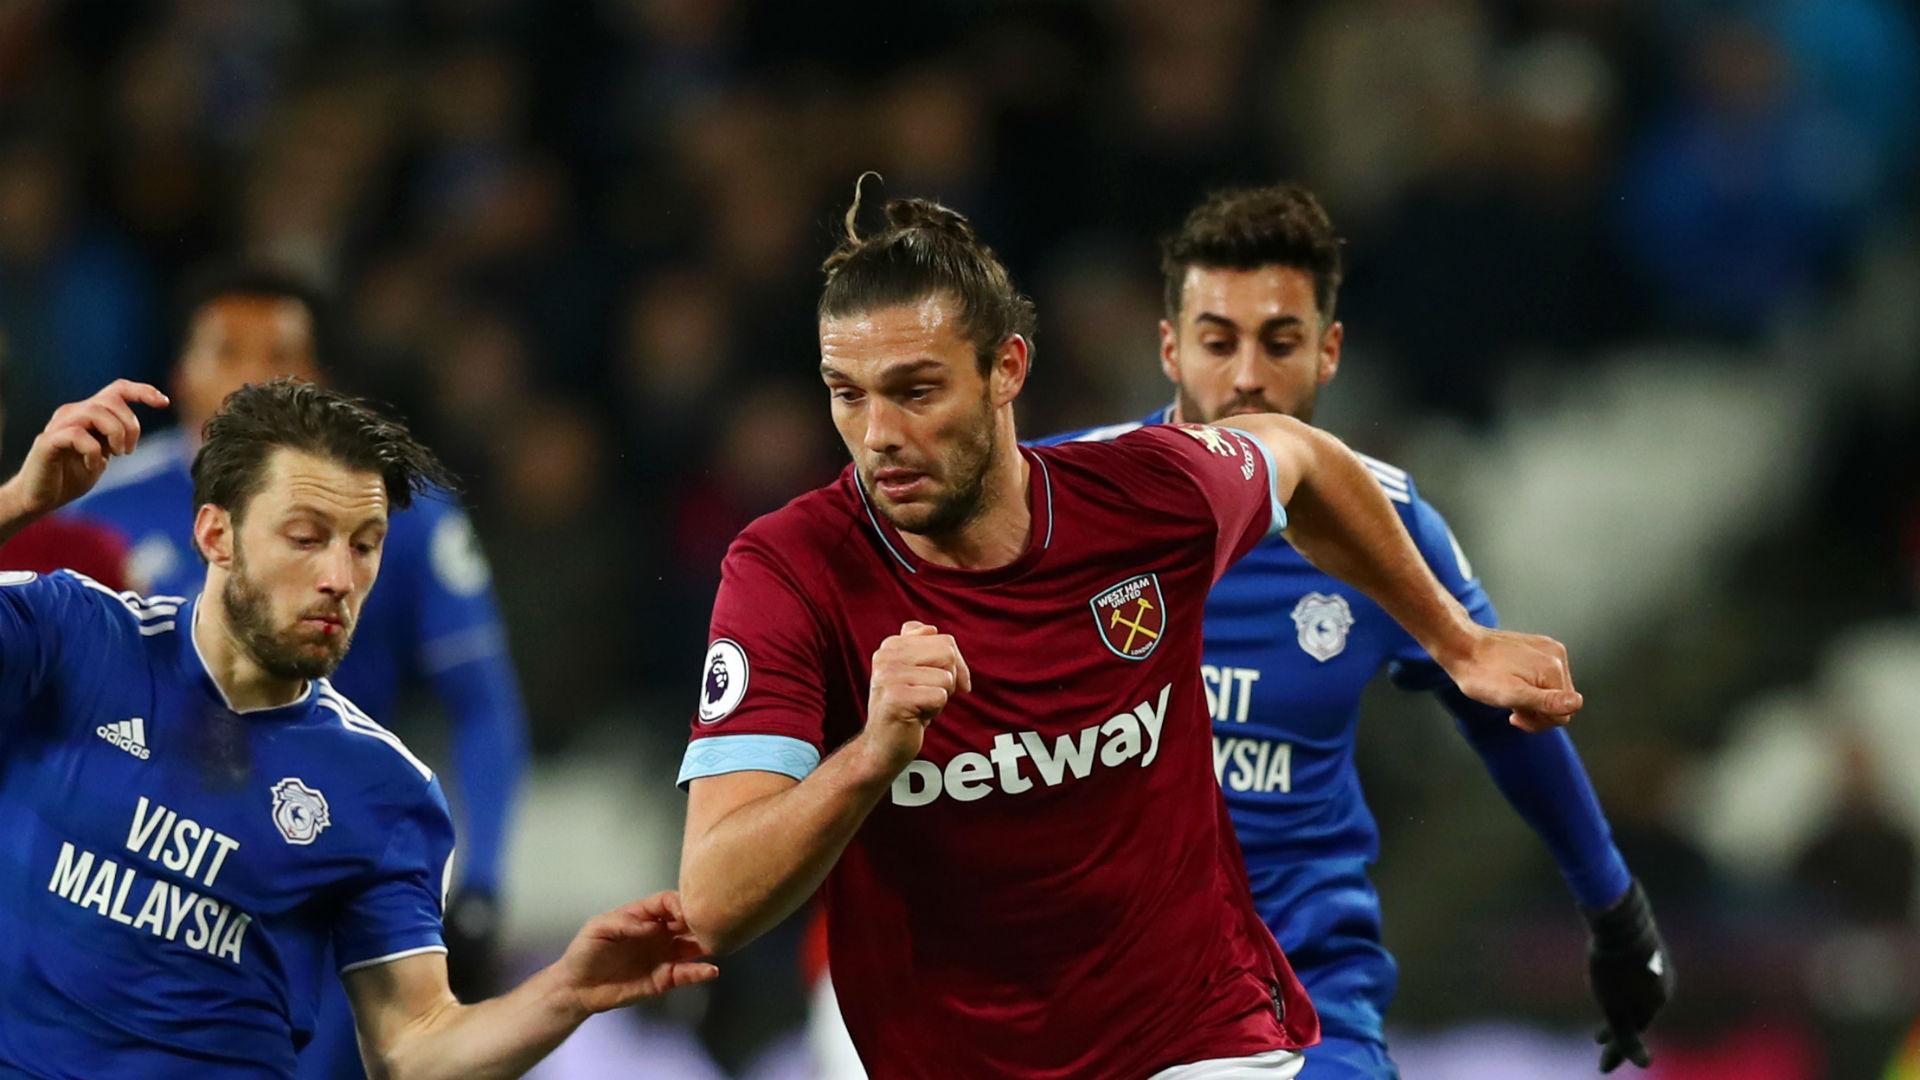 Carroll must earn West Ham extension - Pellegrini